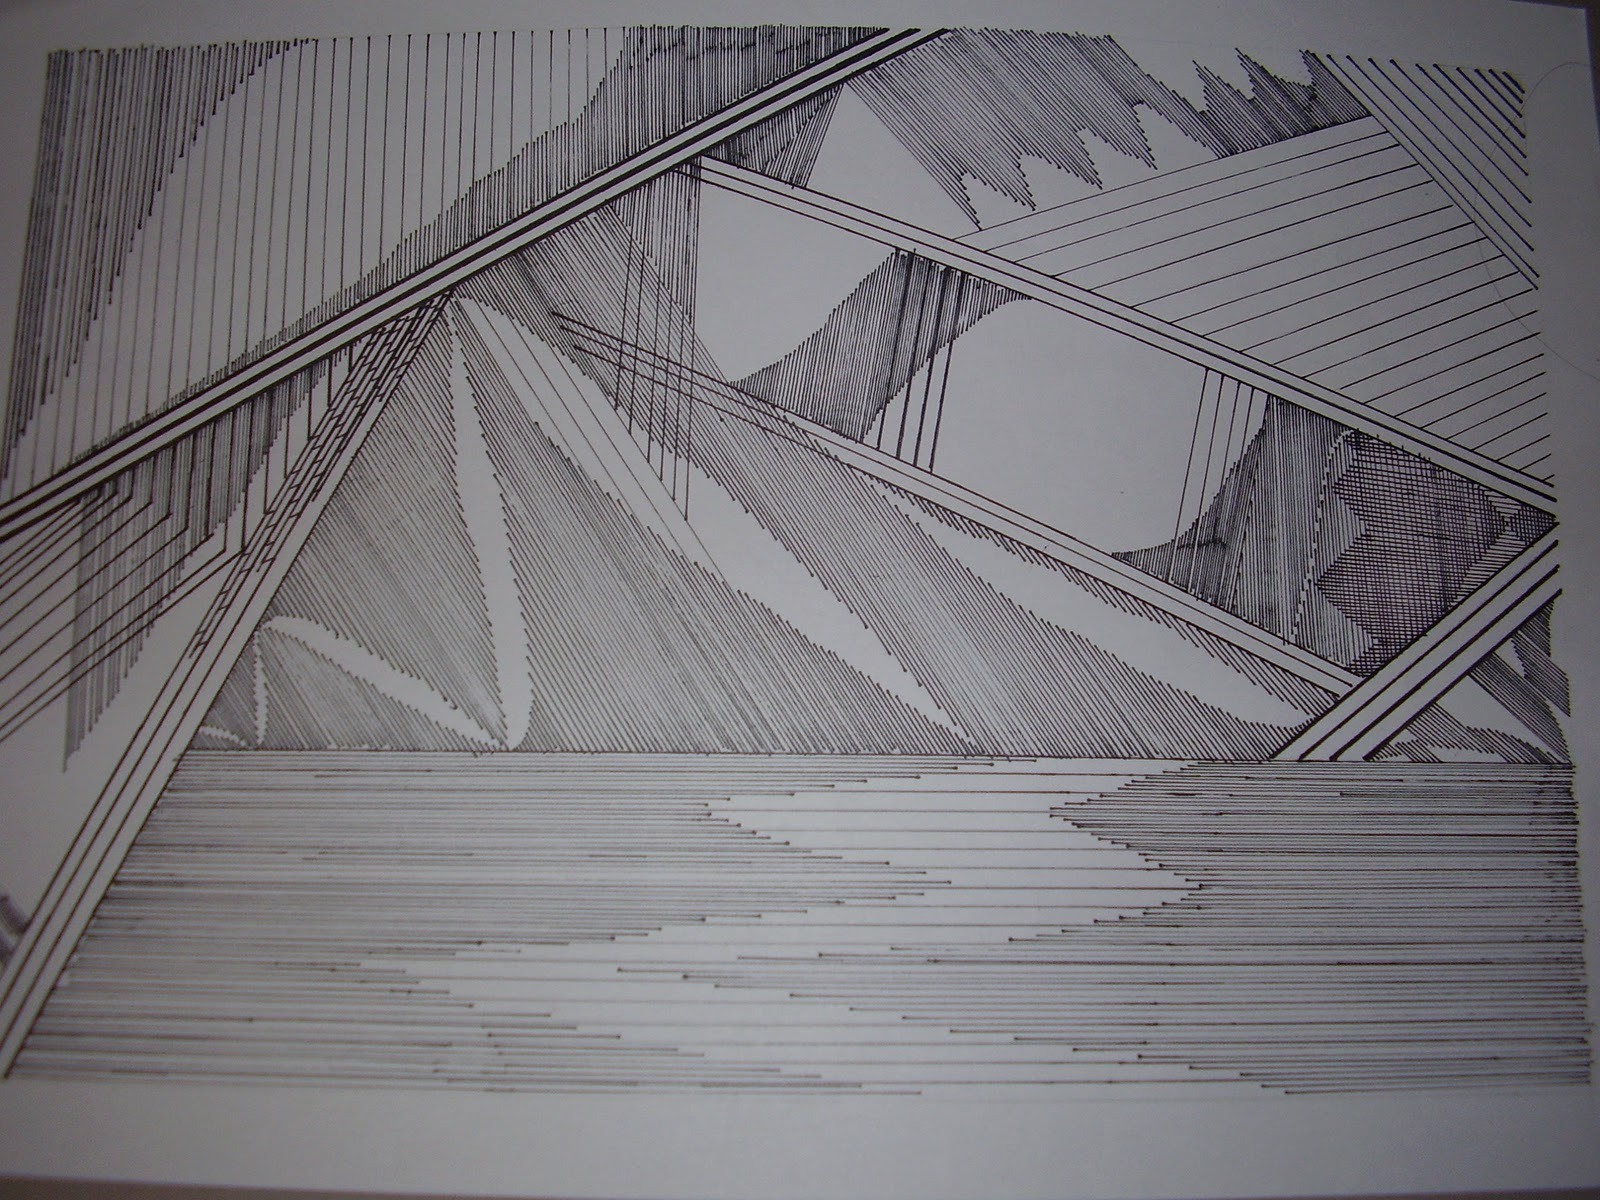 linea recta dibujo abstracto